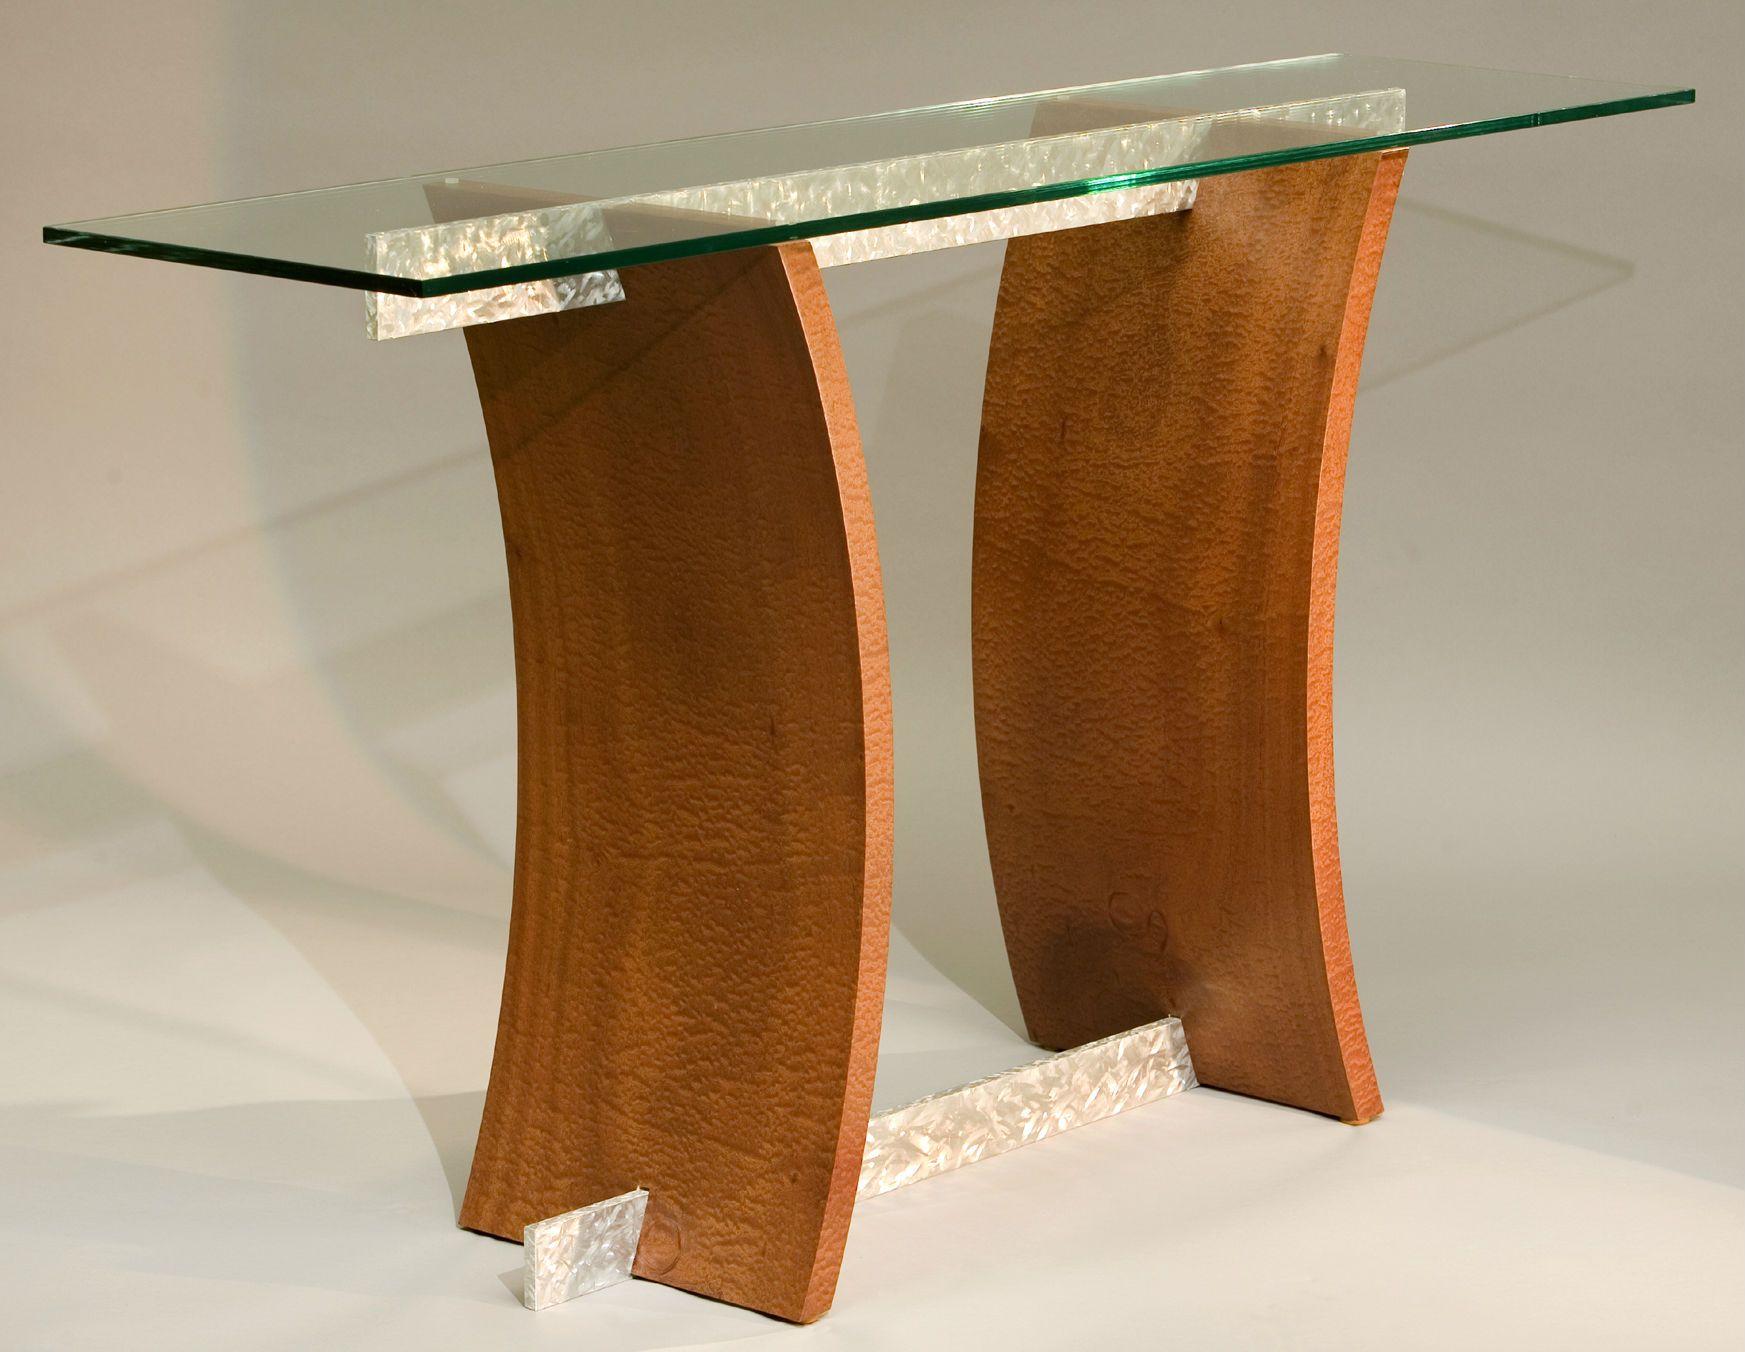 Buy a hand made modern glass top hall table sofa table in wood custom made modern glass top hall table sofa table in wood metal and glass watchthetrailerfo